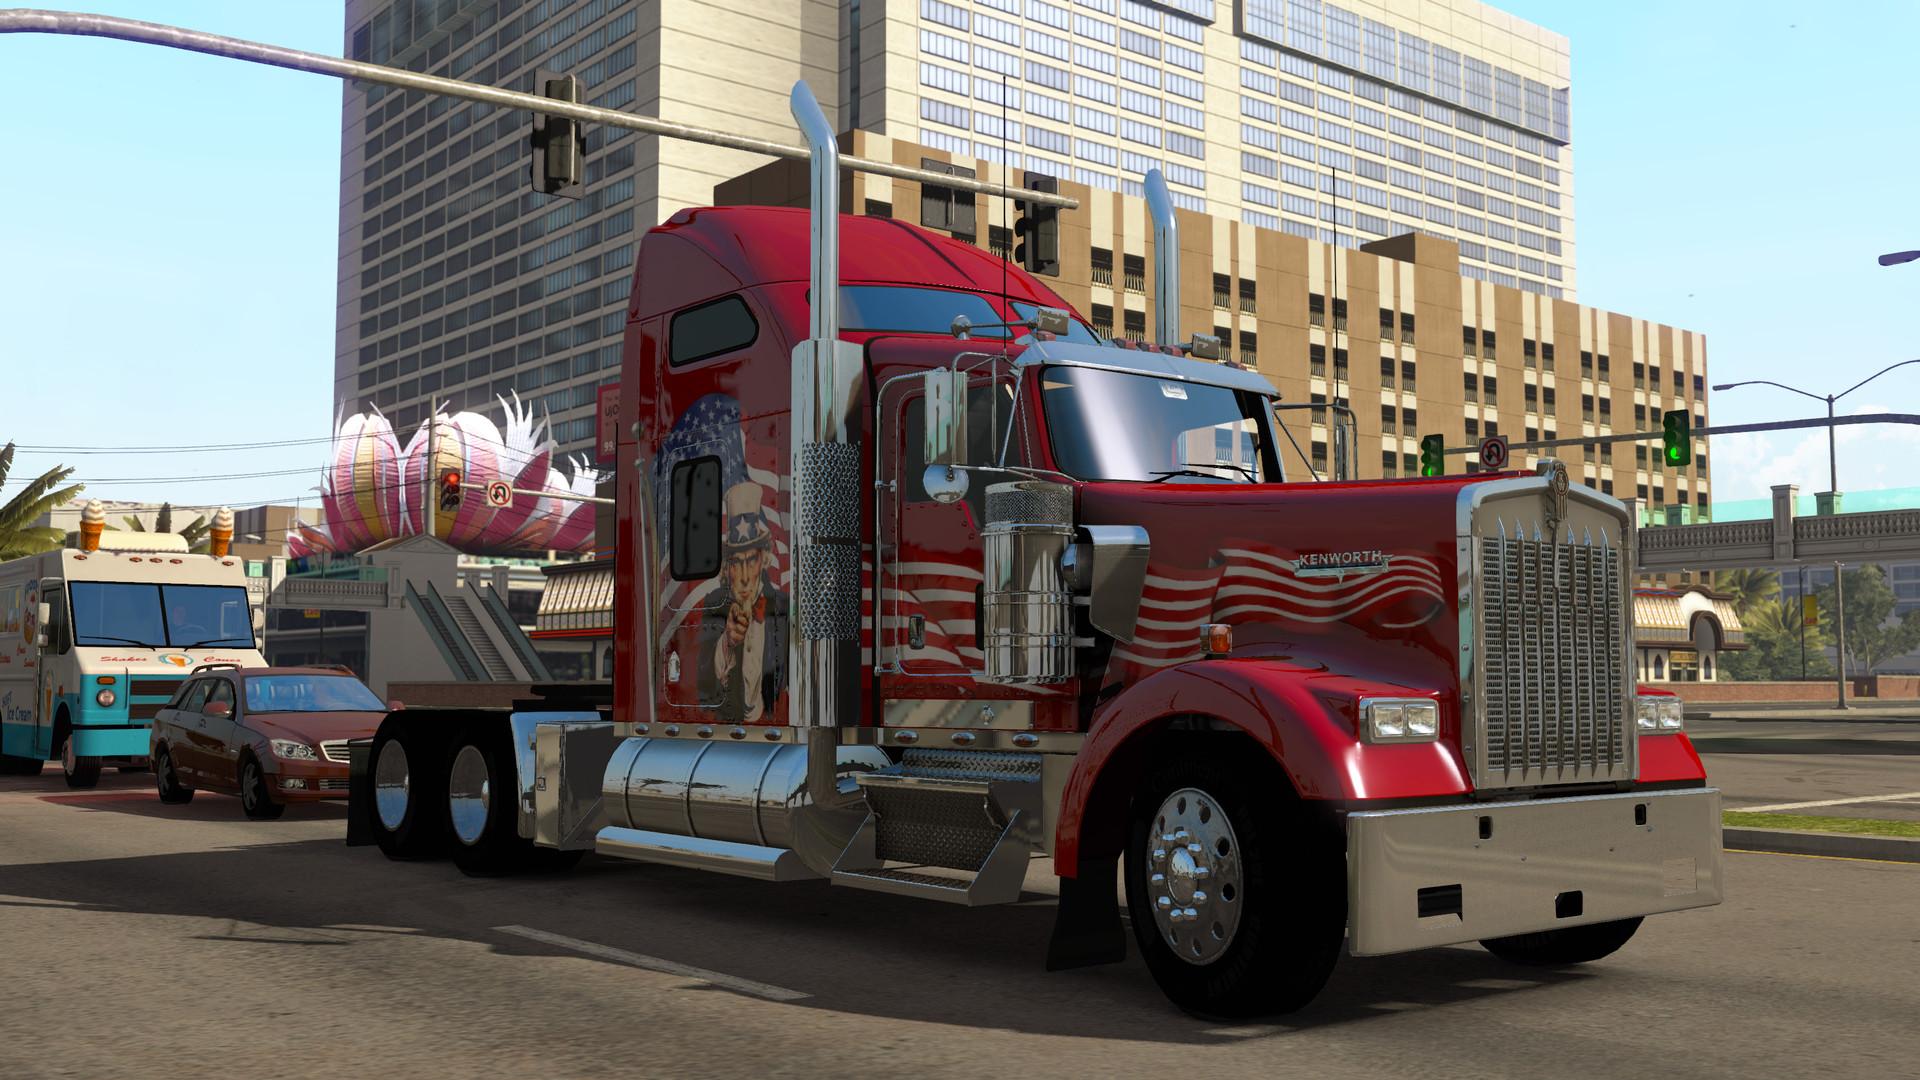 American Truck Simulator trailer shows trucking in the USA